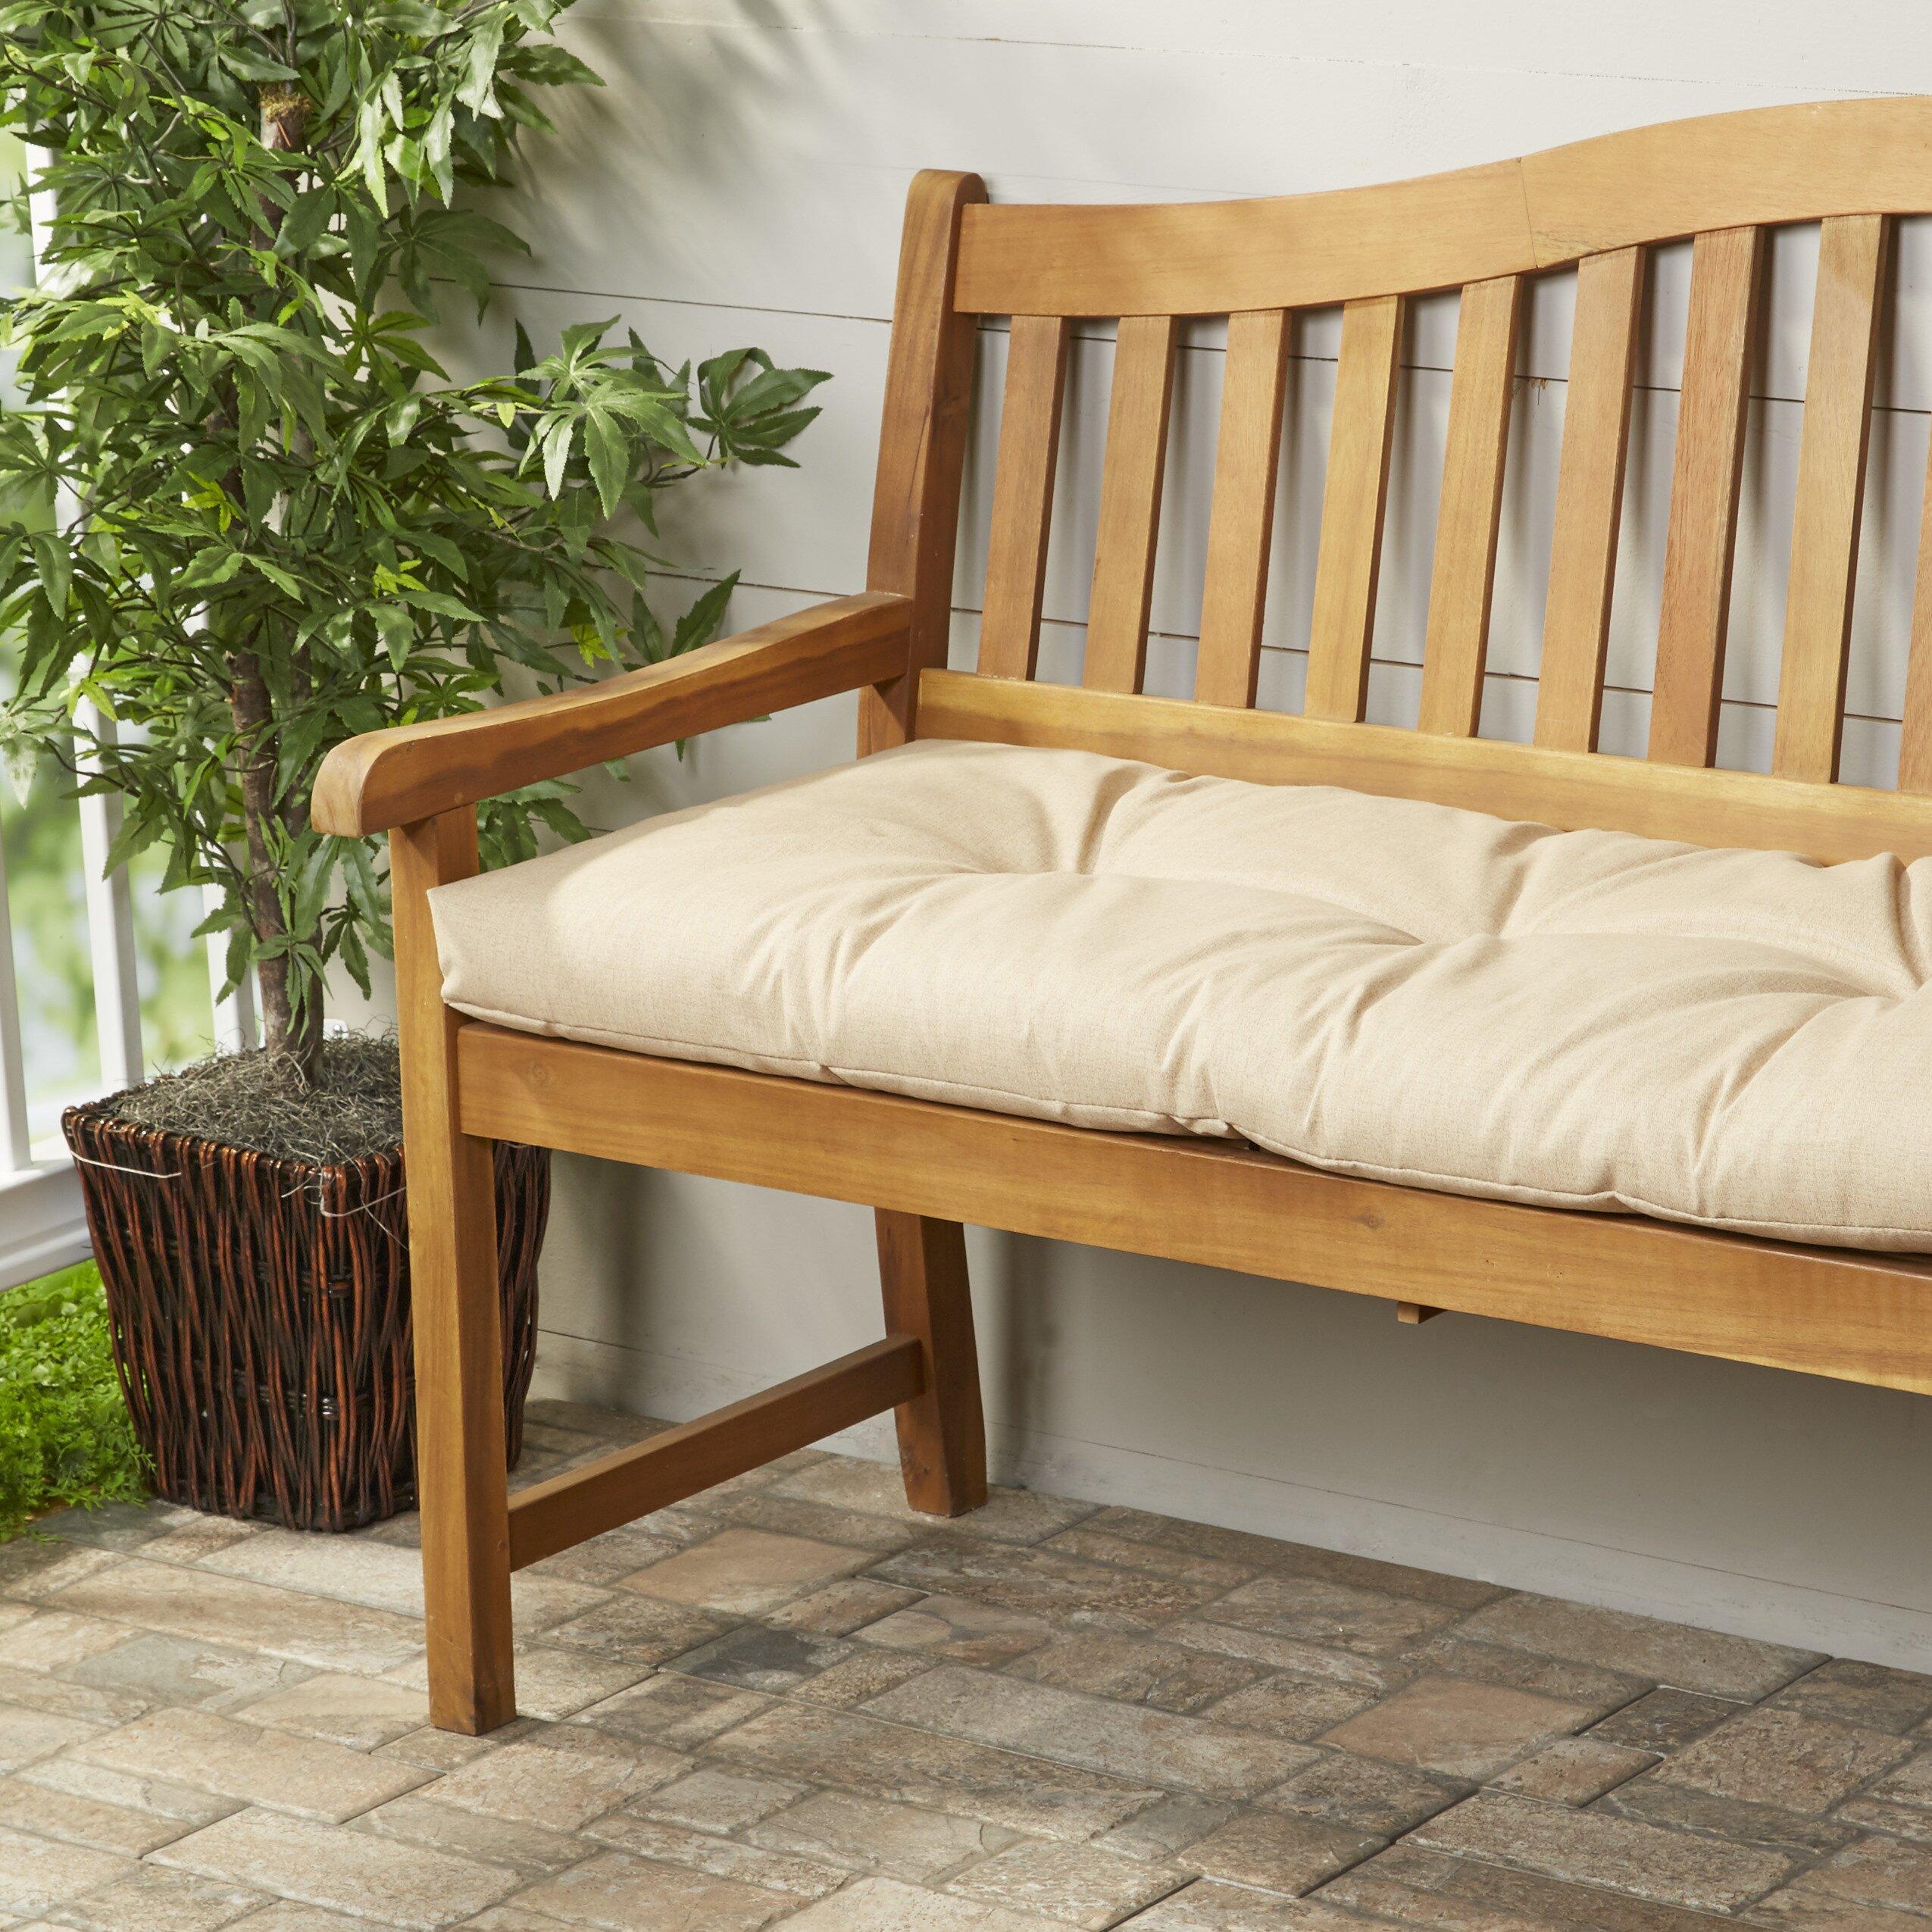 Bench Cusion: Wayfair Basics Wayfair Basics Outdoor Bench Cushion